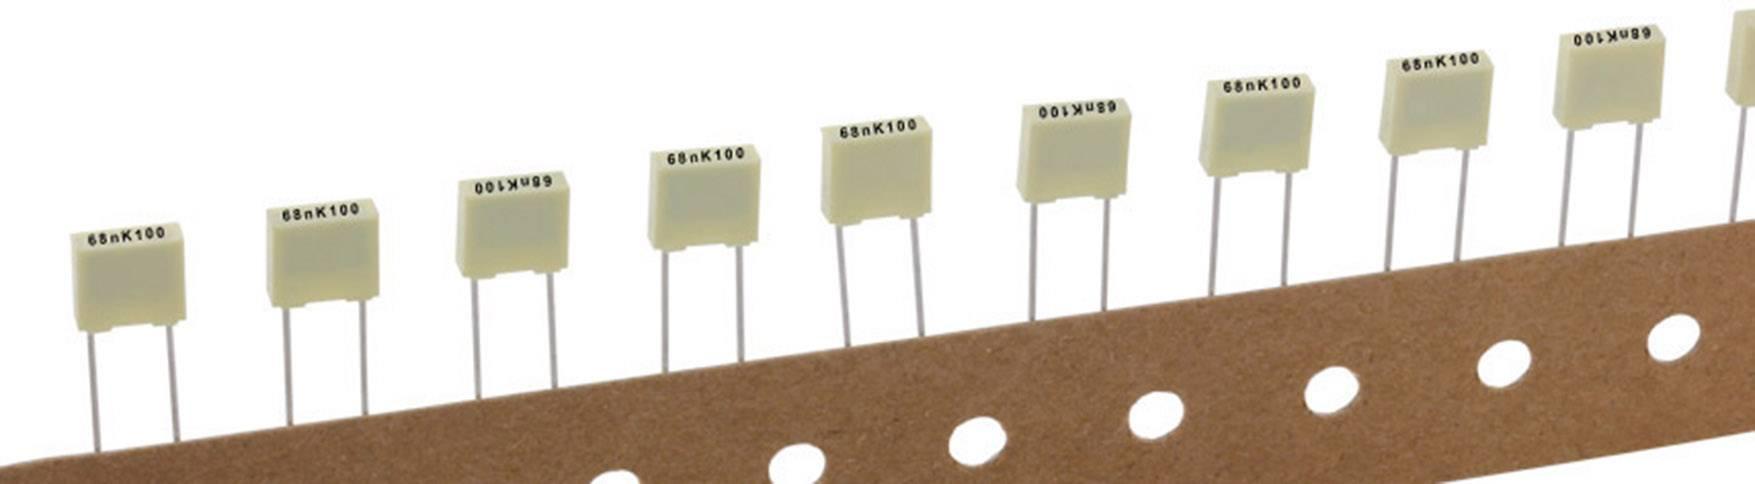 Polyesterový kondenzátor Kemet R82DC3330DQ60K+ radiální, 330 nF, 63 V,10 %, 5 mm, (d x š x v) 7.2 x 3.5 mm x 7.5 mm, 1 ks